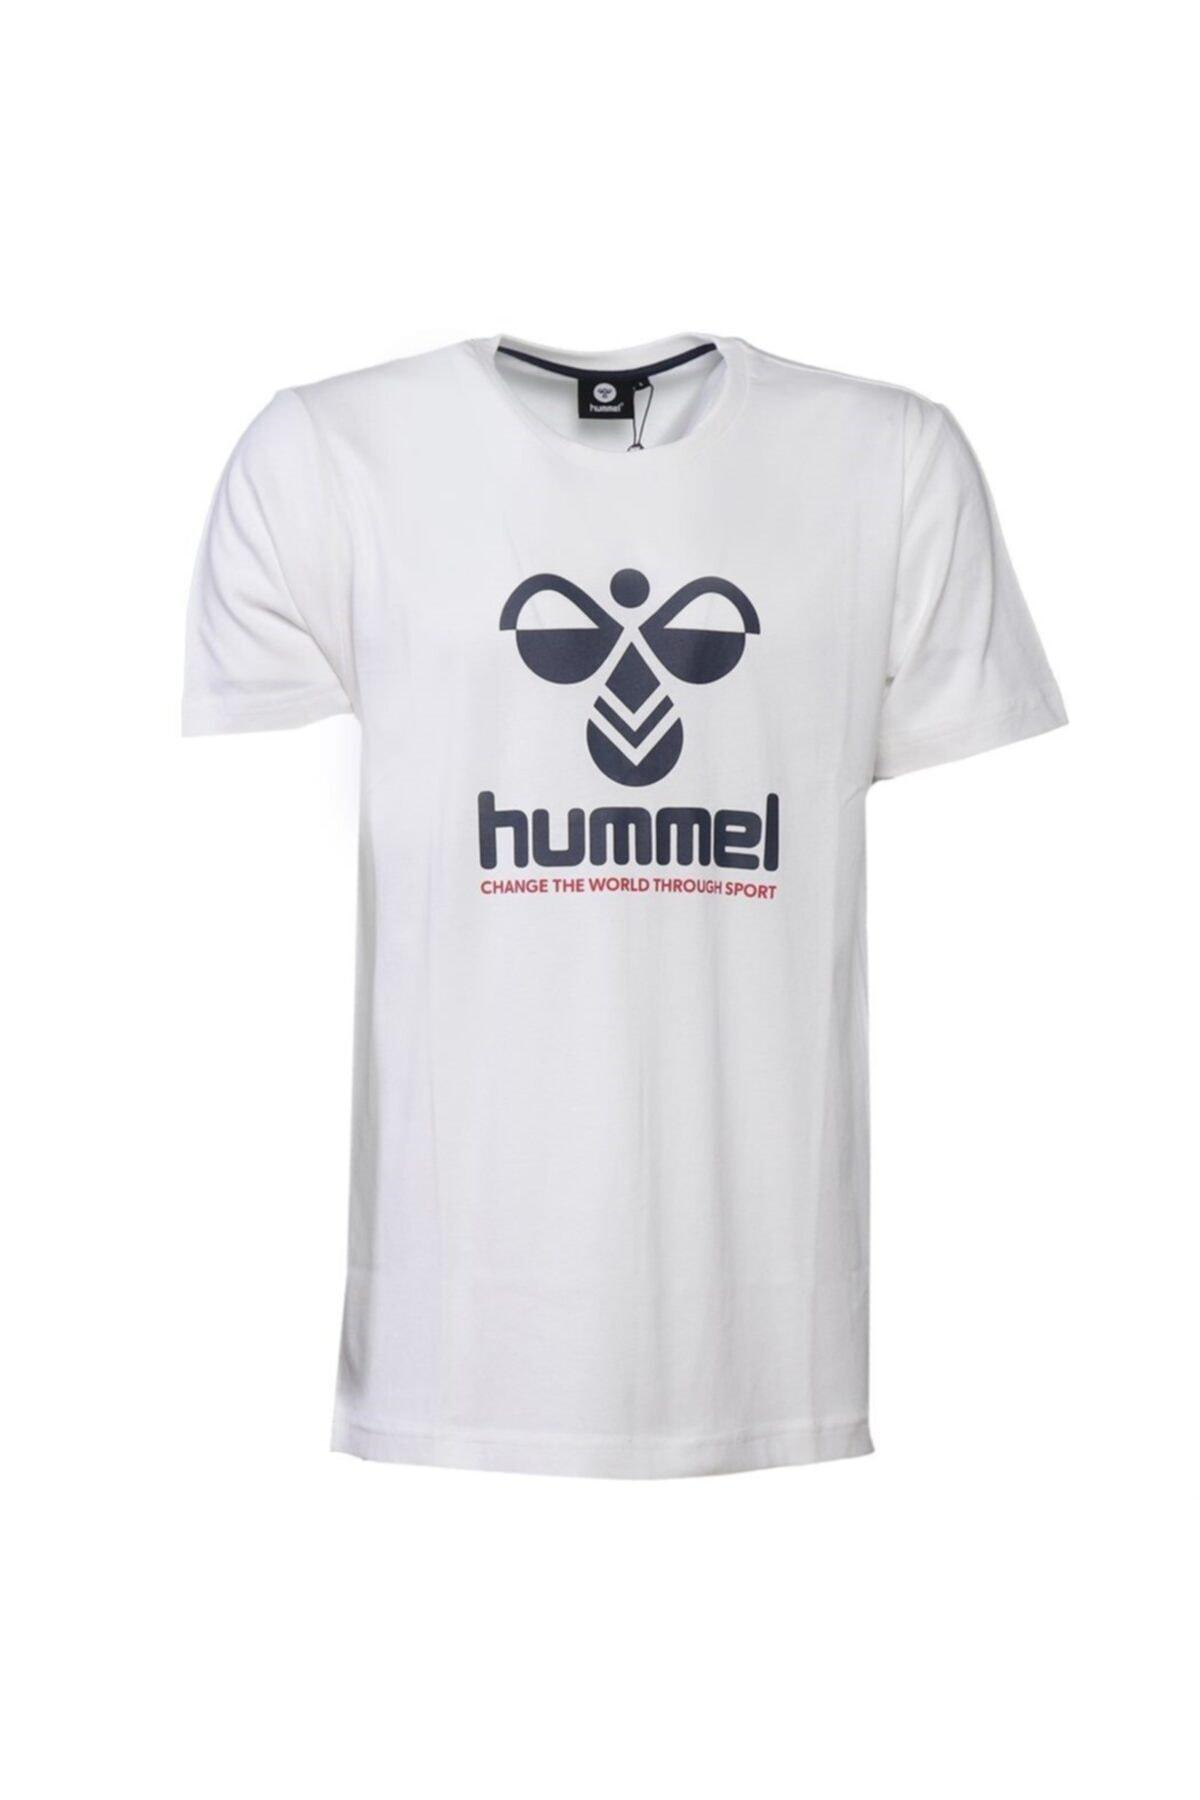 HUMMEL Erkek Tişört Centil 911301-9003 1